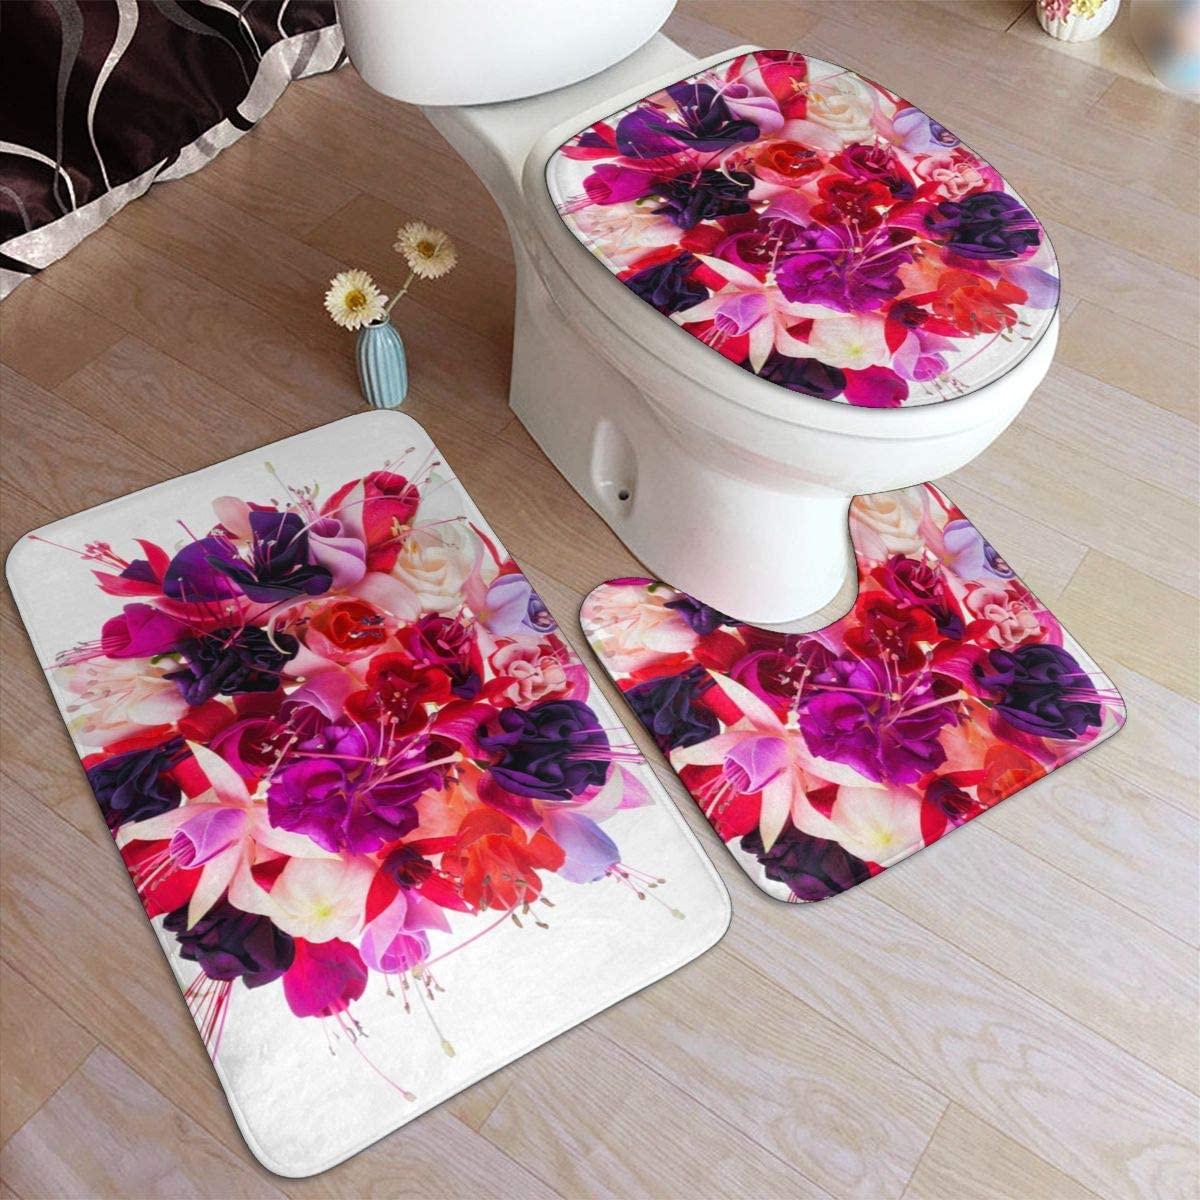 Bath Rugs Toilet Three-Piece Floor mat, Delicate Flower Flannel Embossing Bath Rugs 50x80cm